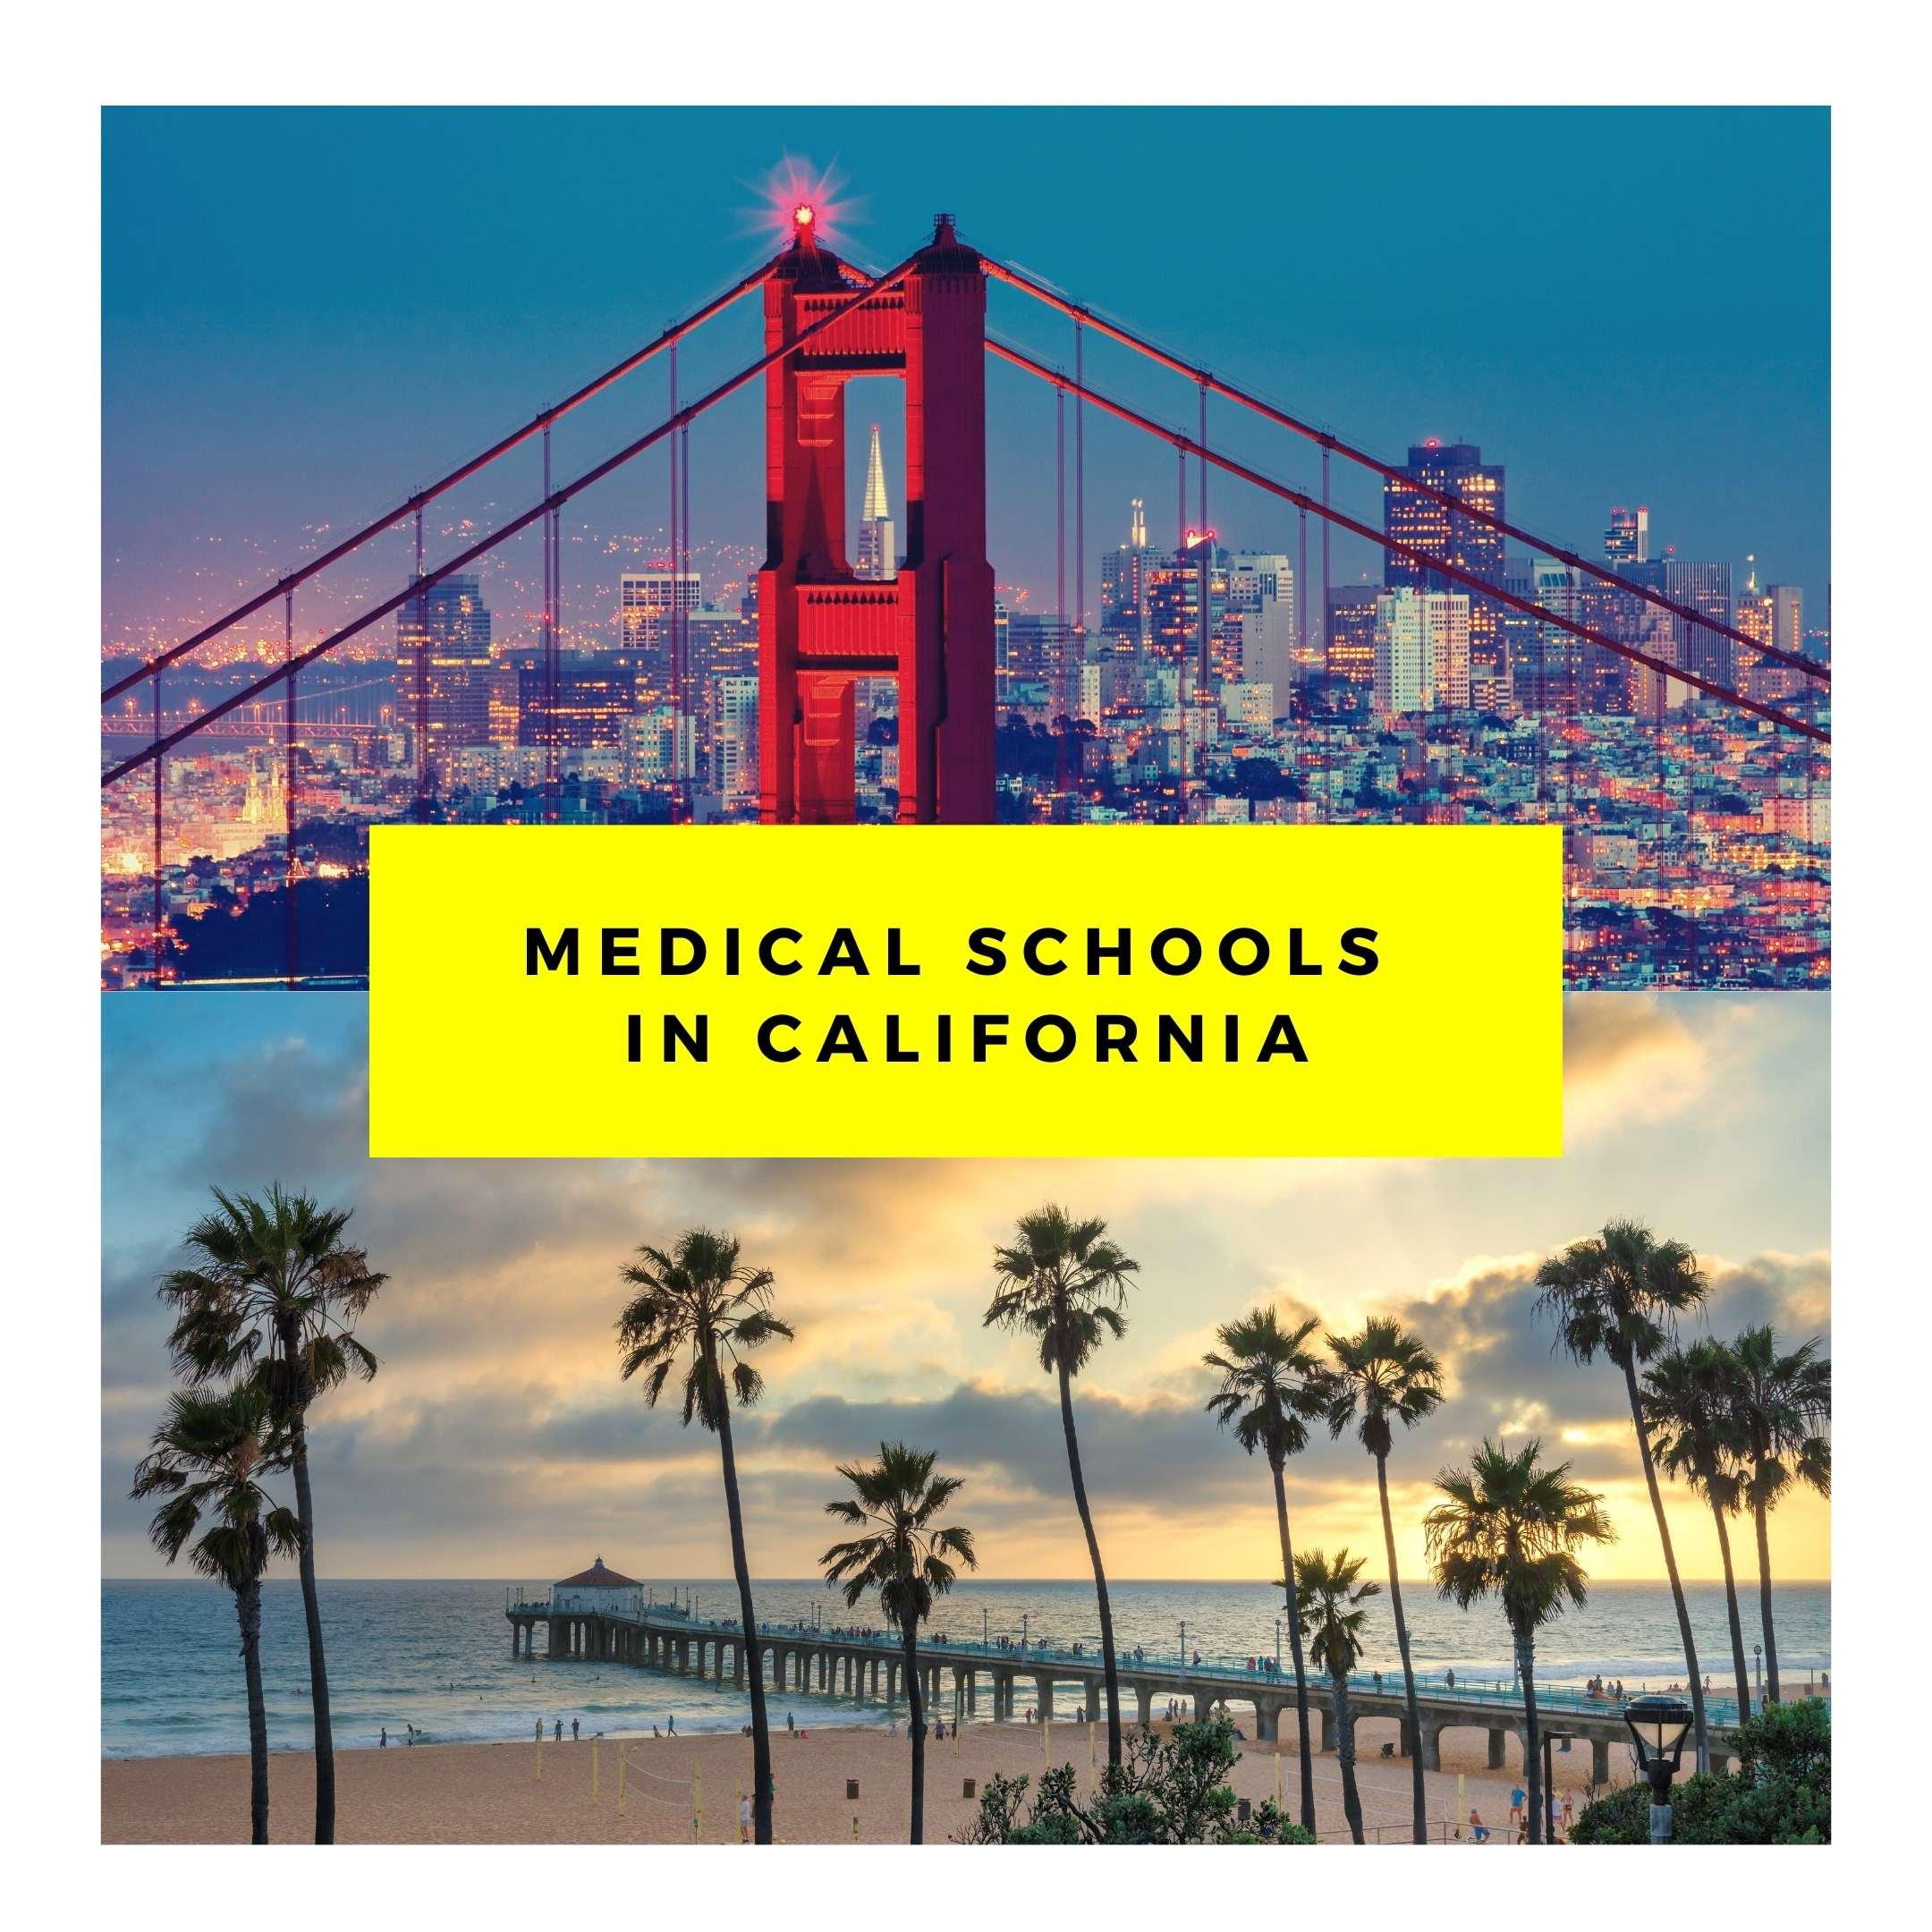 Medical Schools in California